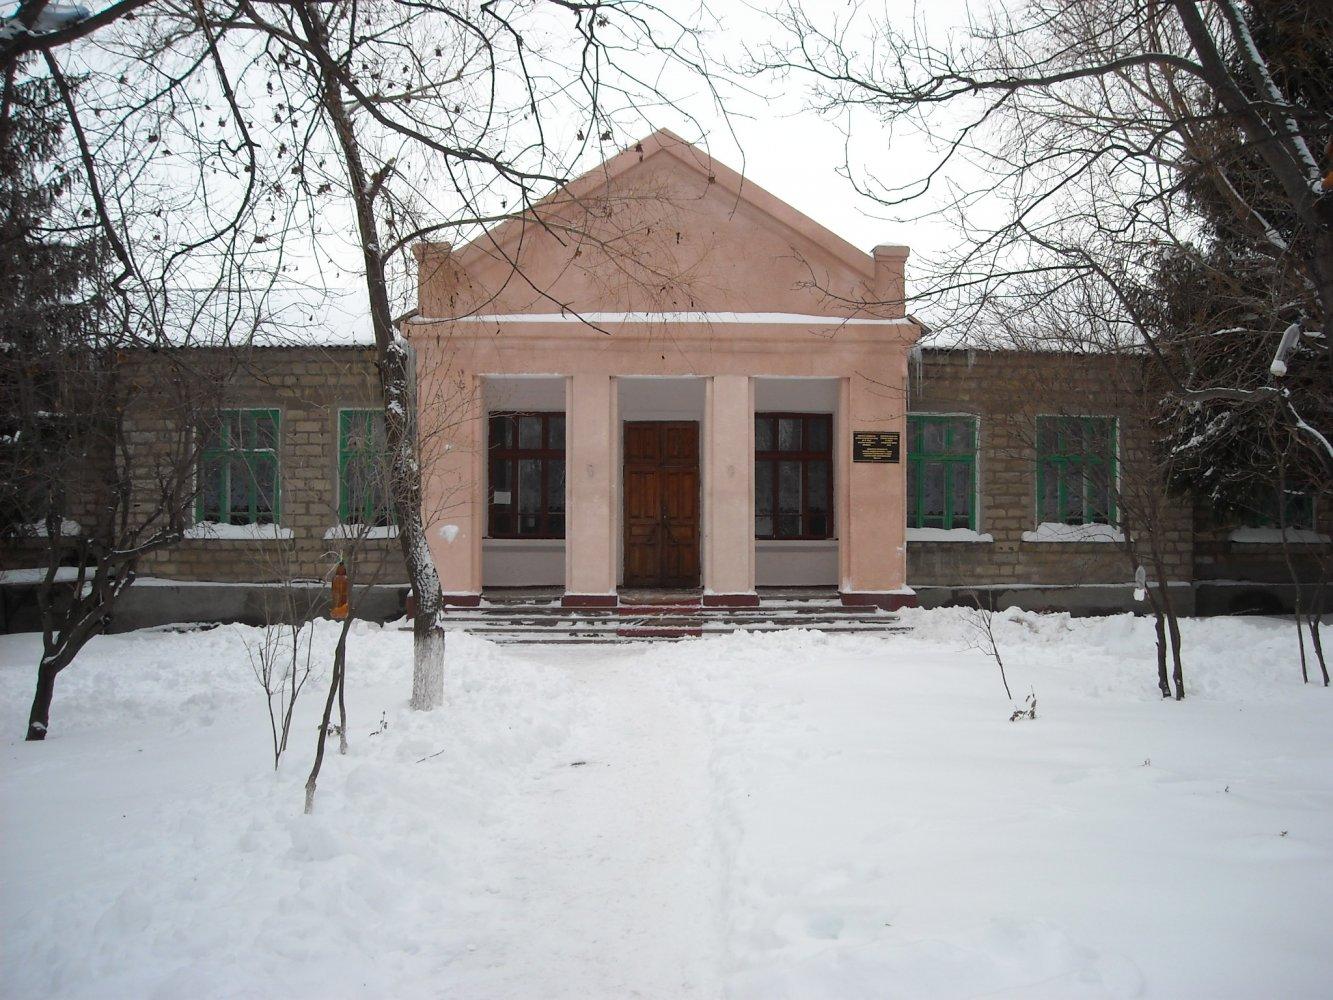 Фото DSCN0069.JPG. Молдова, Бендеры, улица Протягайловская